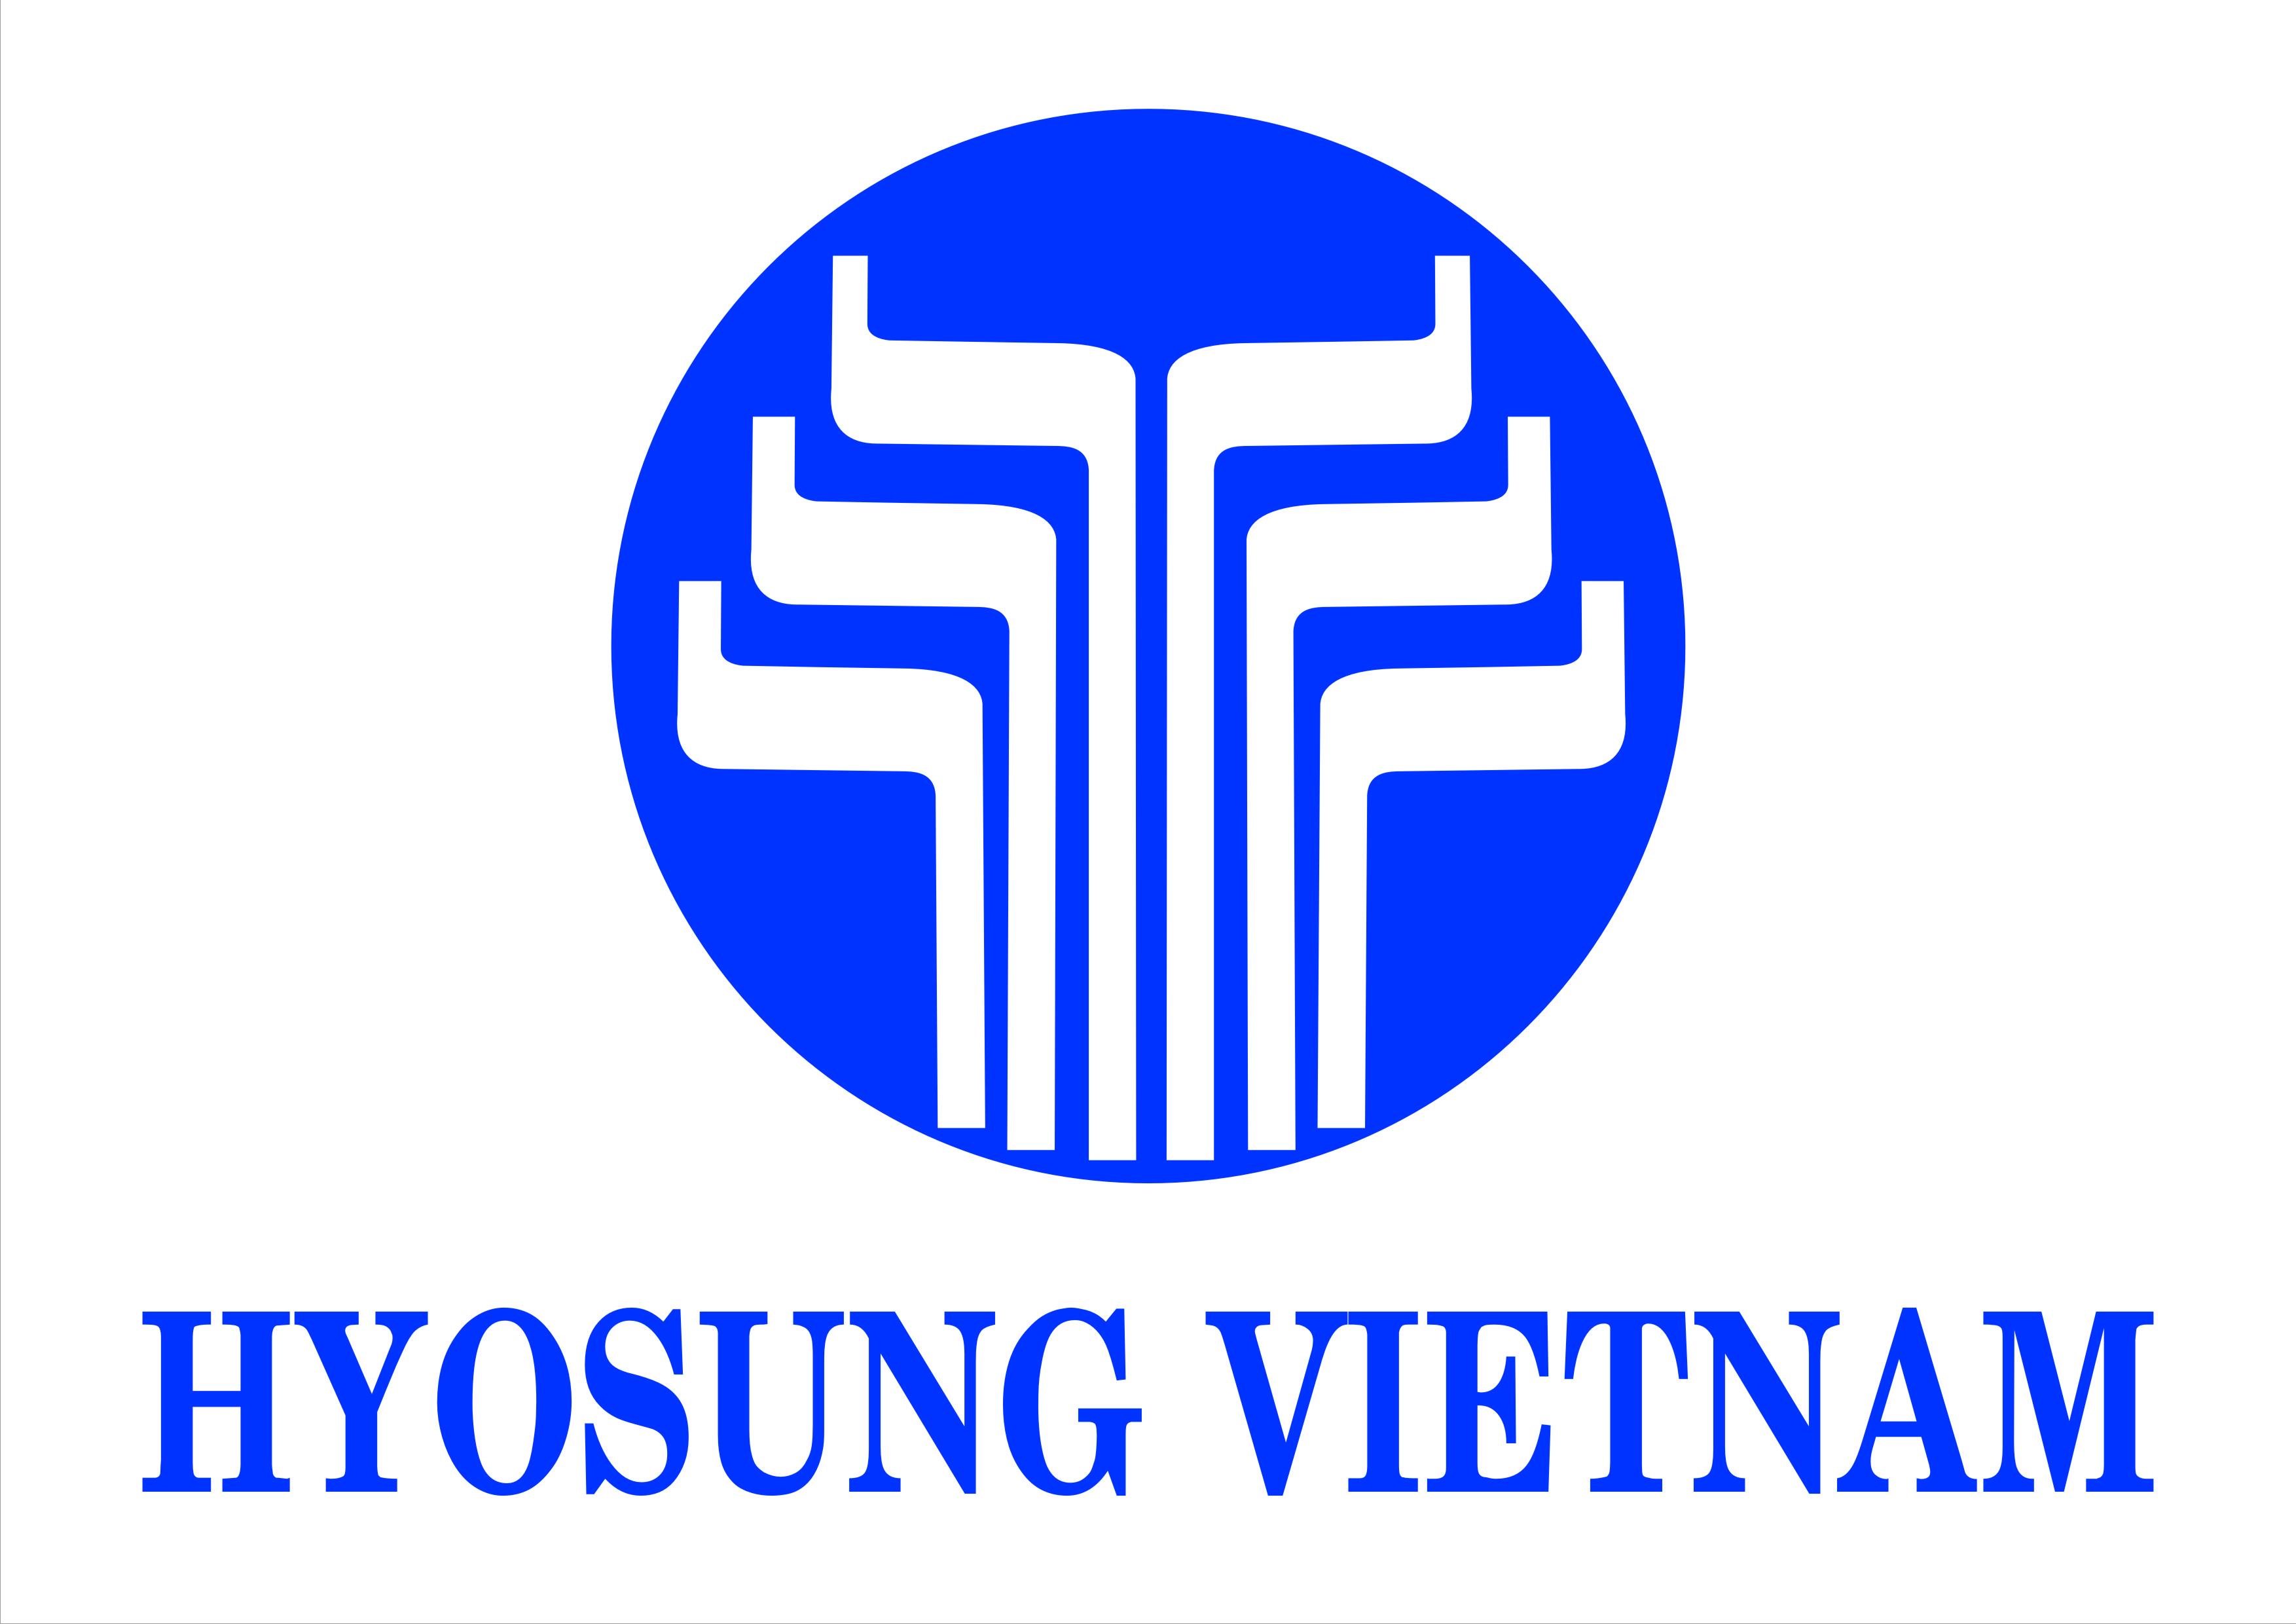 144737logohyosungvietnam